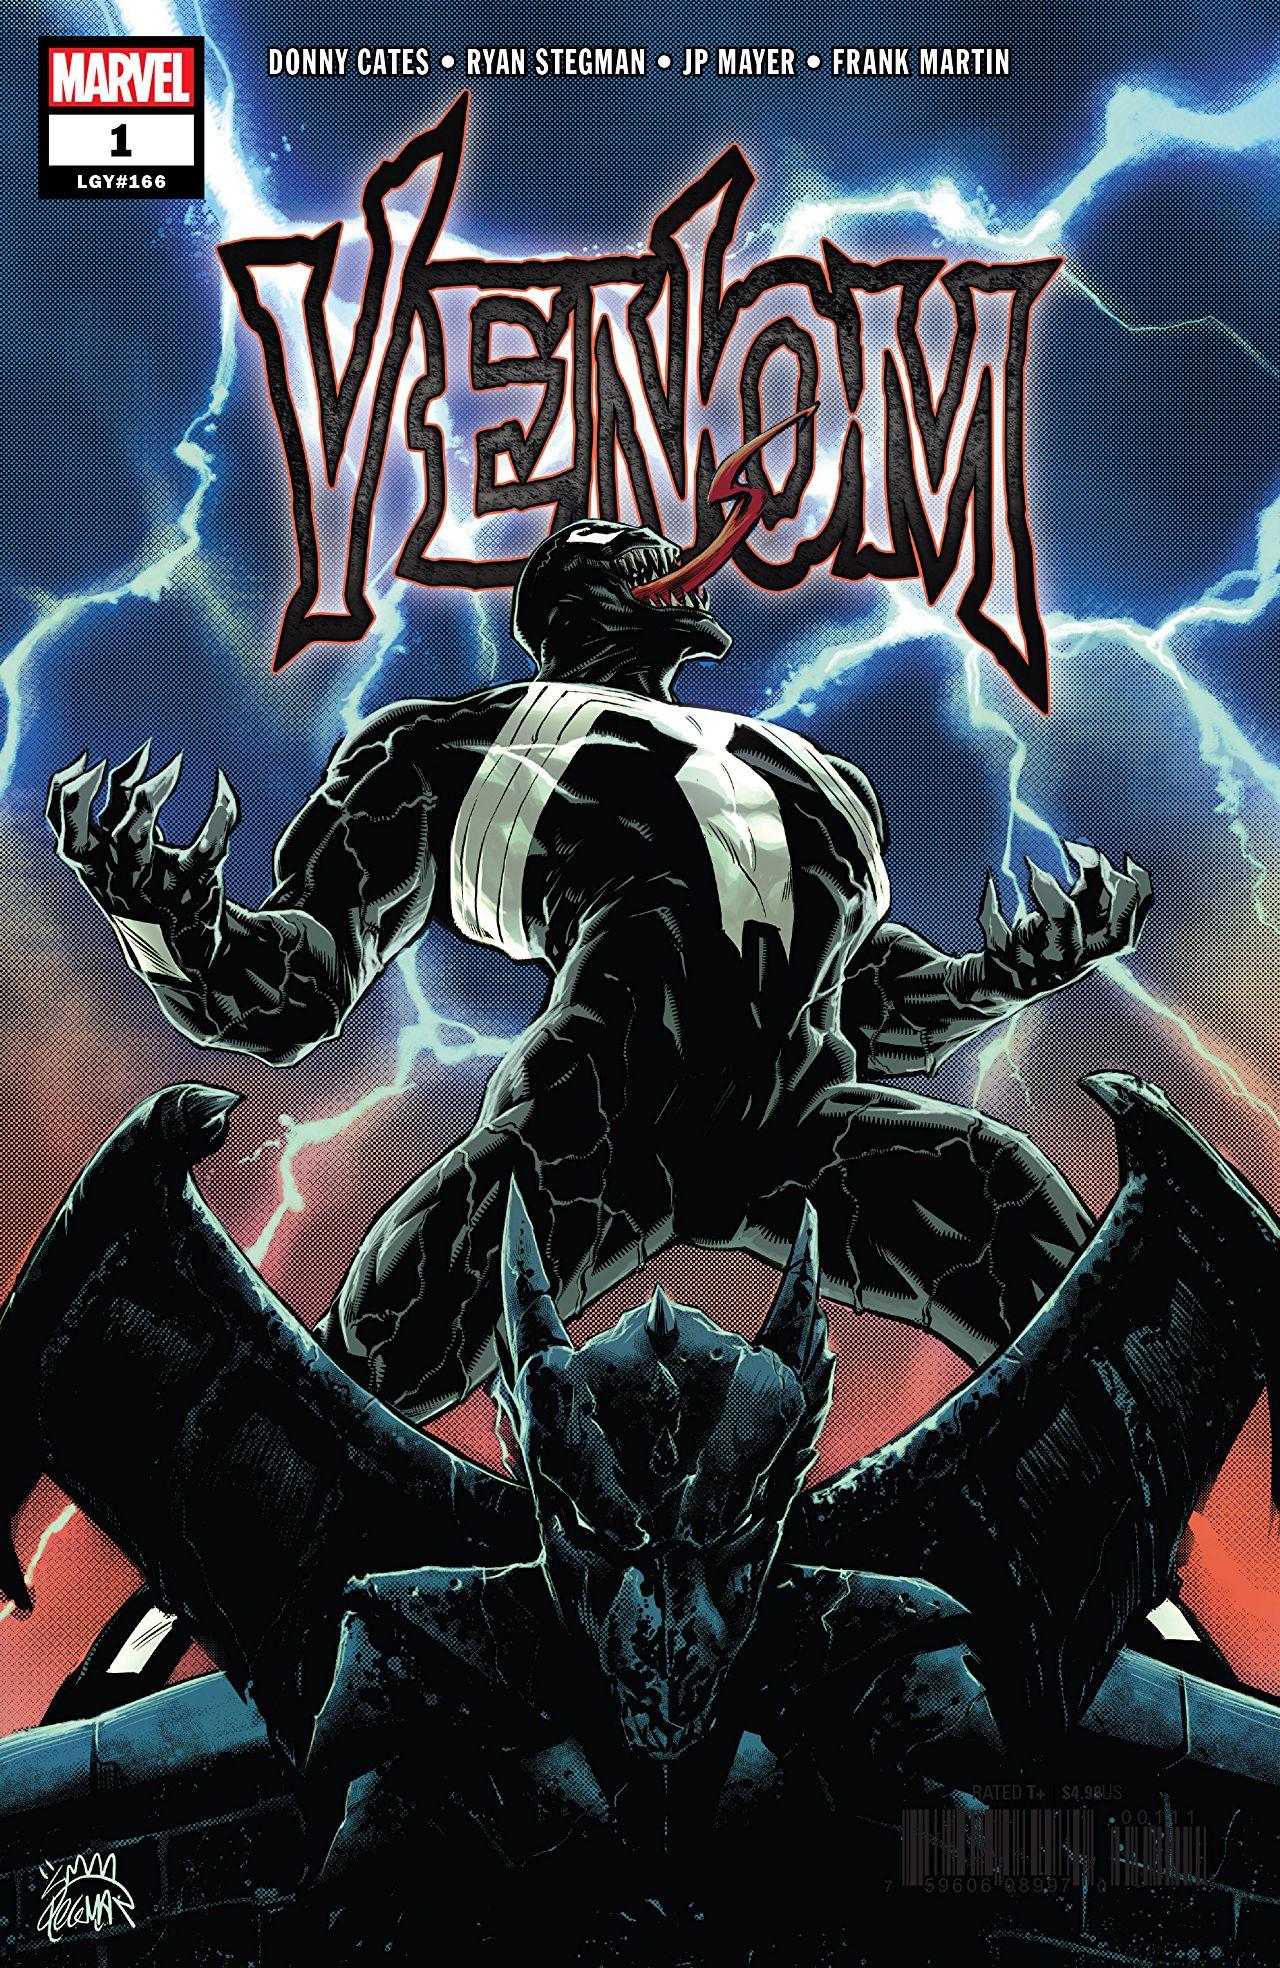 Venom (2018) #1 Review (Spoilers) - Spider Man Crawlspace